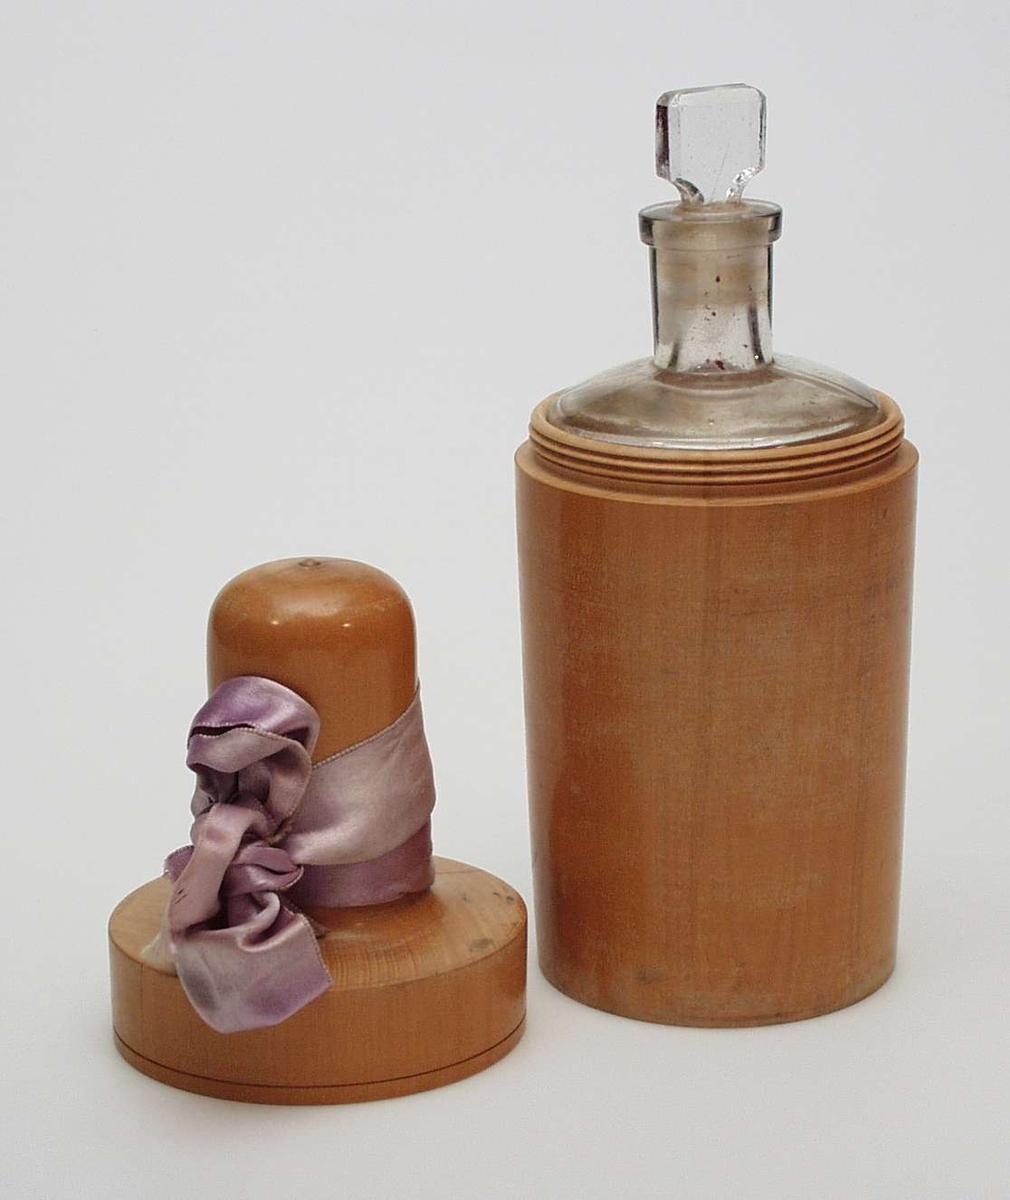 Rund parfymeflaske i pressglass med beholder i tre. Beholderen har skrulukking. Den er dekorert med et lilla silkebånd.